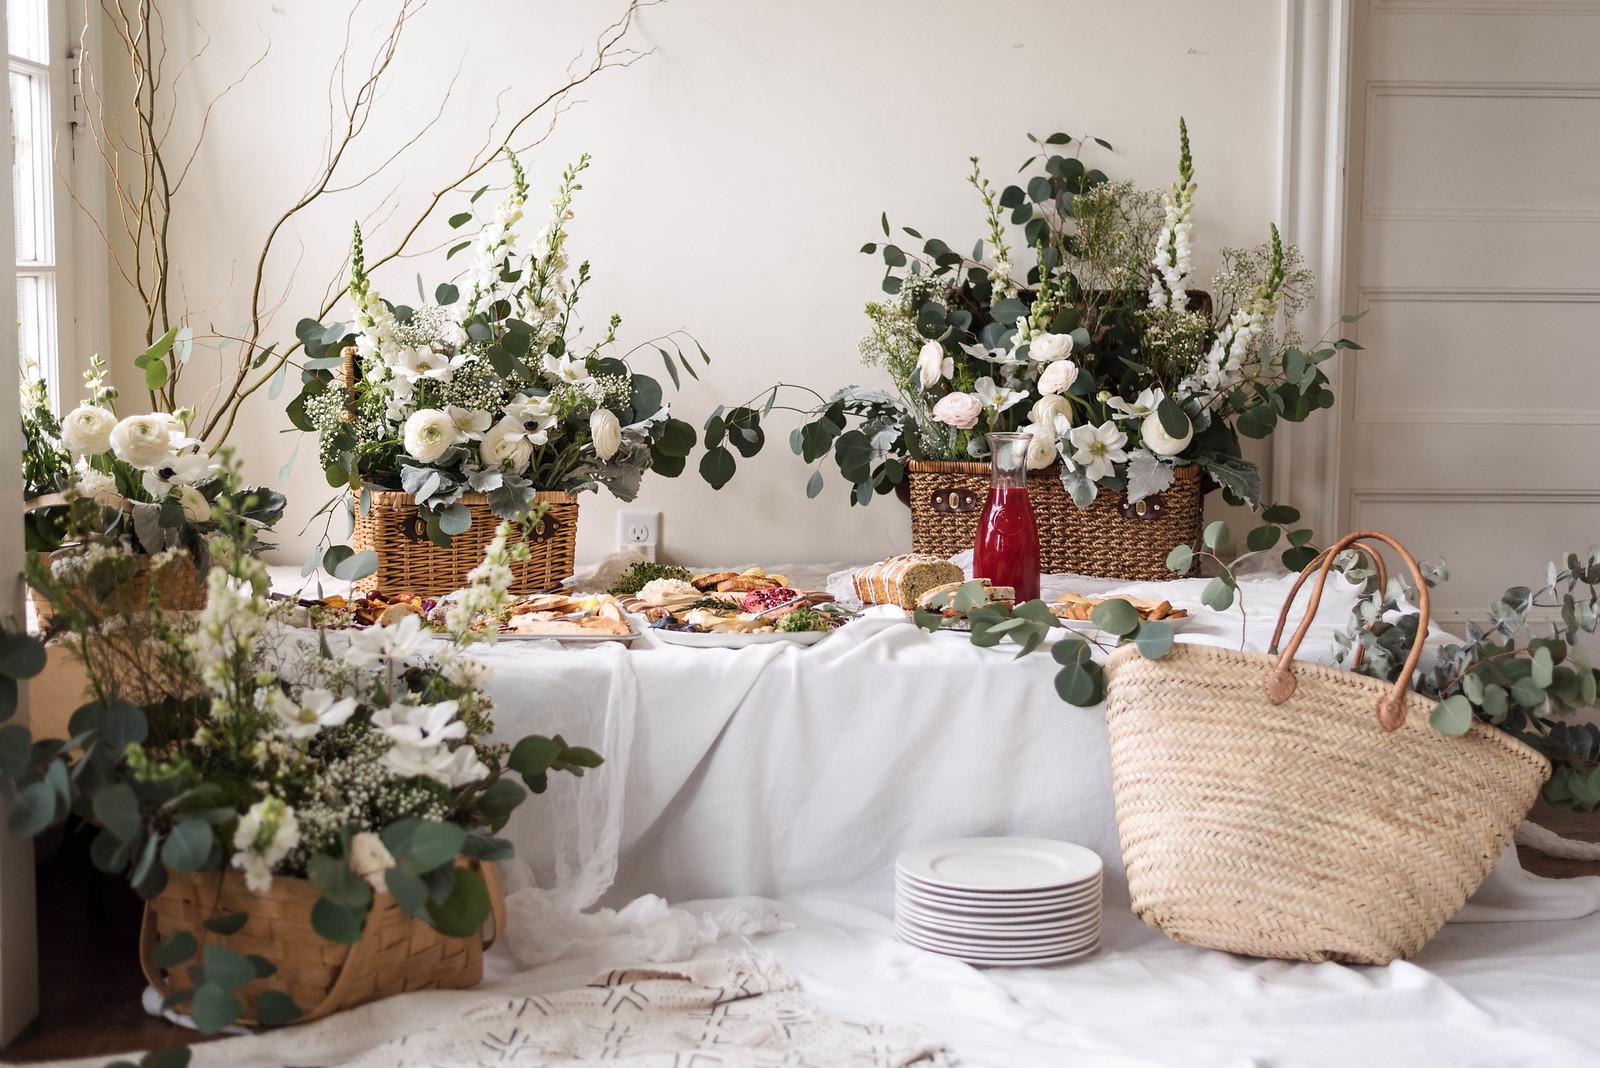 Floral Picnic Basket Arrangments on http://juliettelaura.blogspot.com/